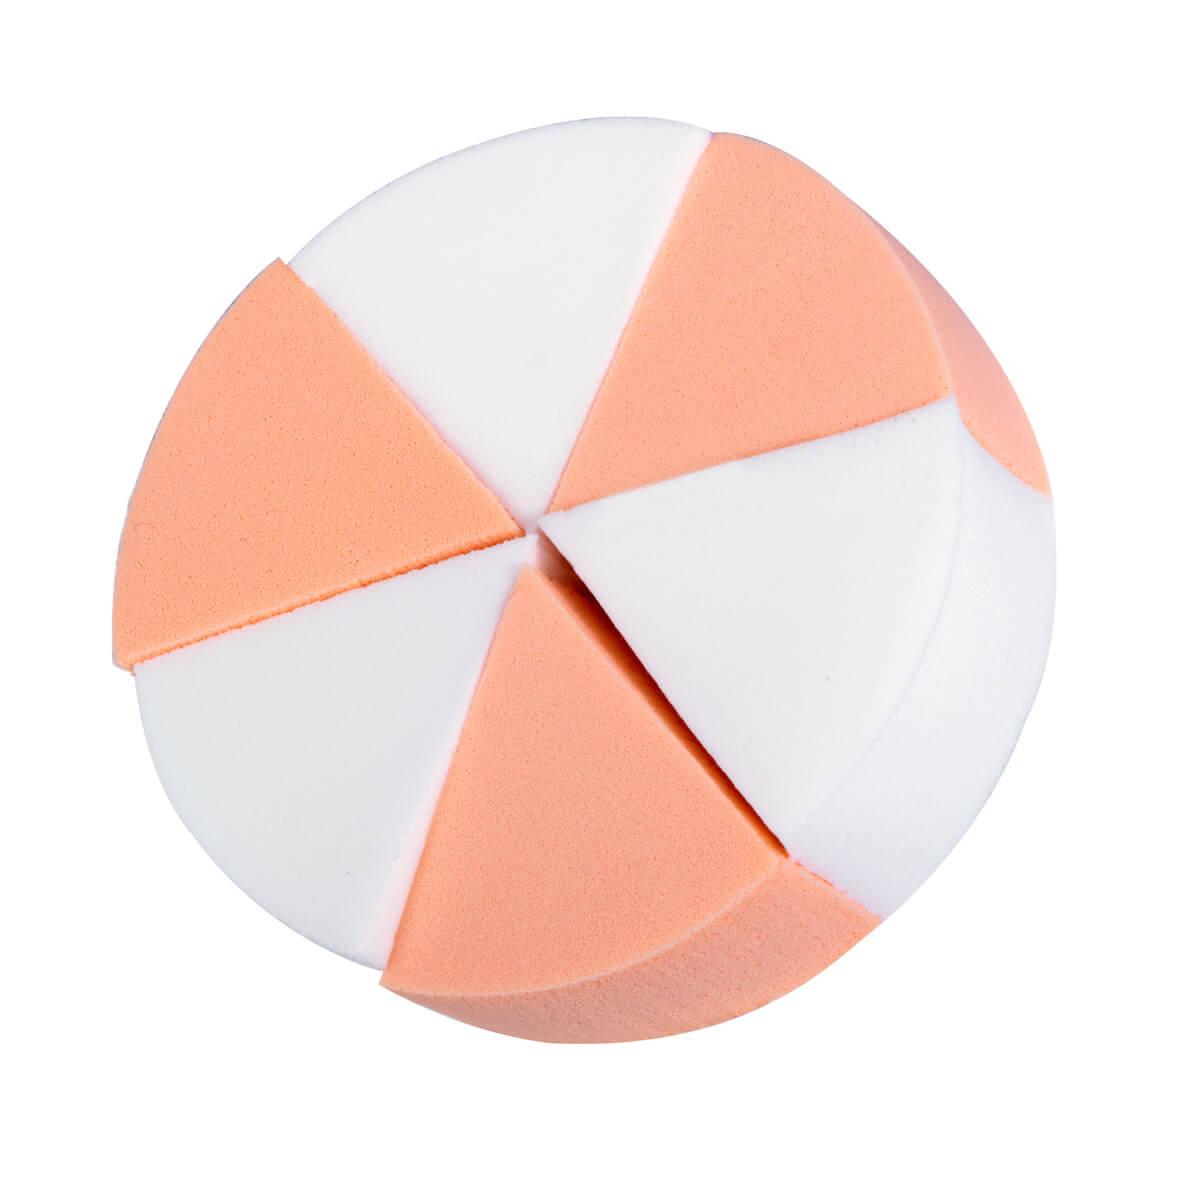 Kit 6 Esponjas Queijinho Triangular R805 Sffumato Beauty